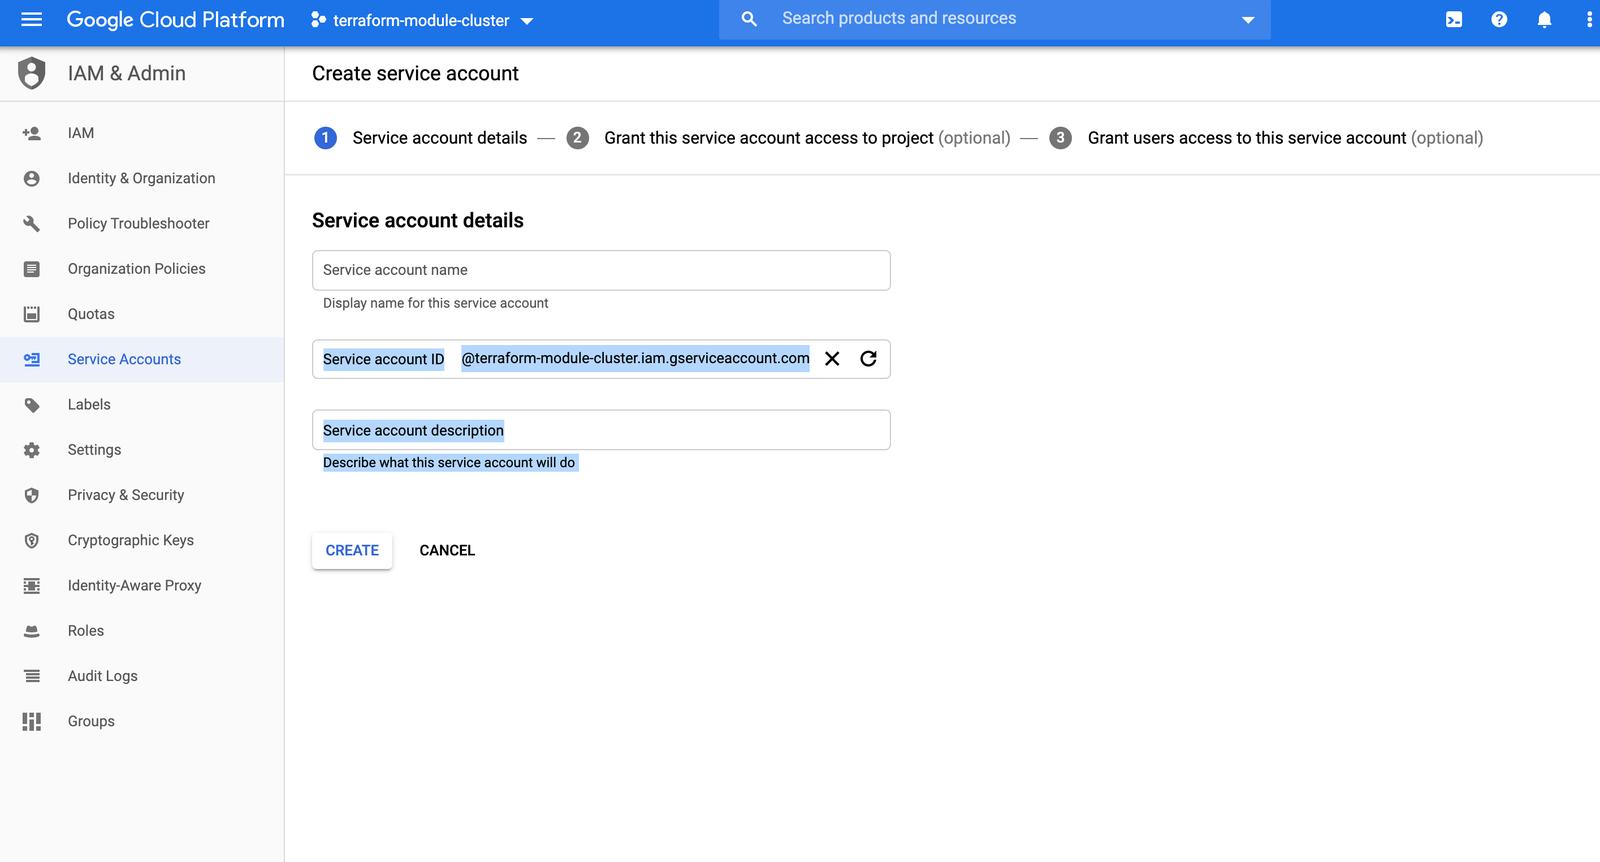 GCP Screenshot IAM and ADMIN Service Accounts